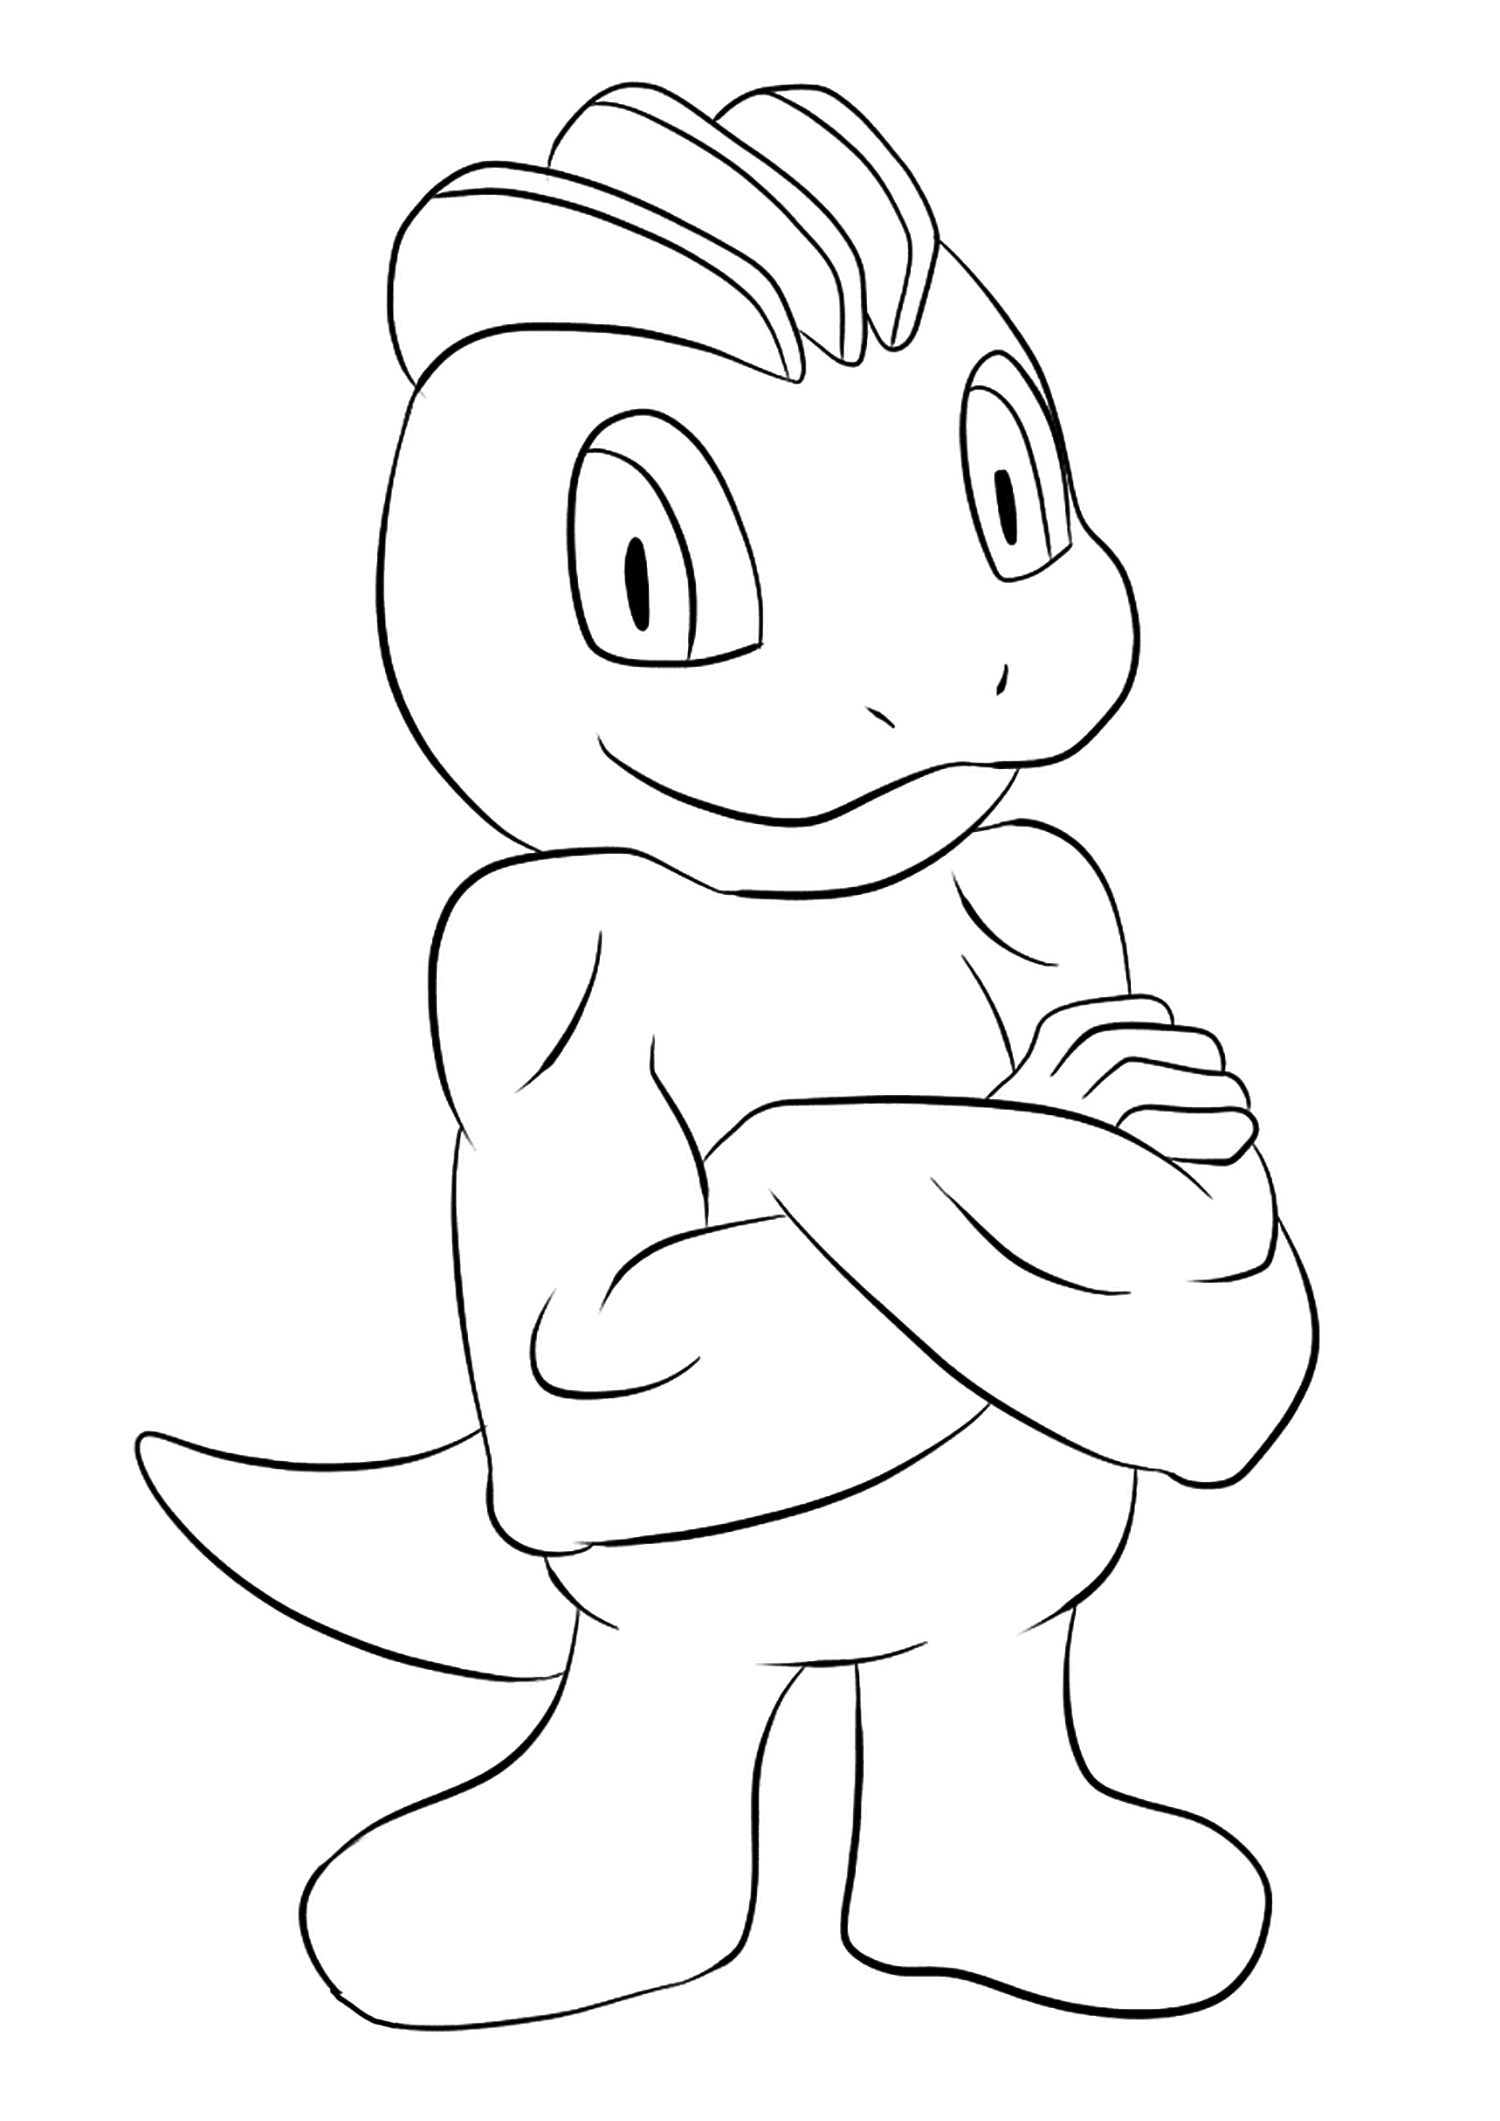 <b>Machoc</b> (No.66) : Pokémon de génération I